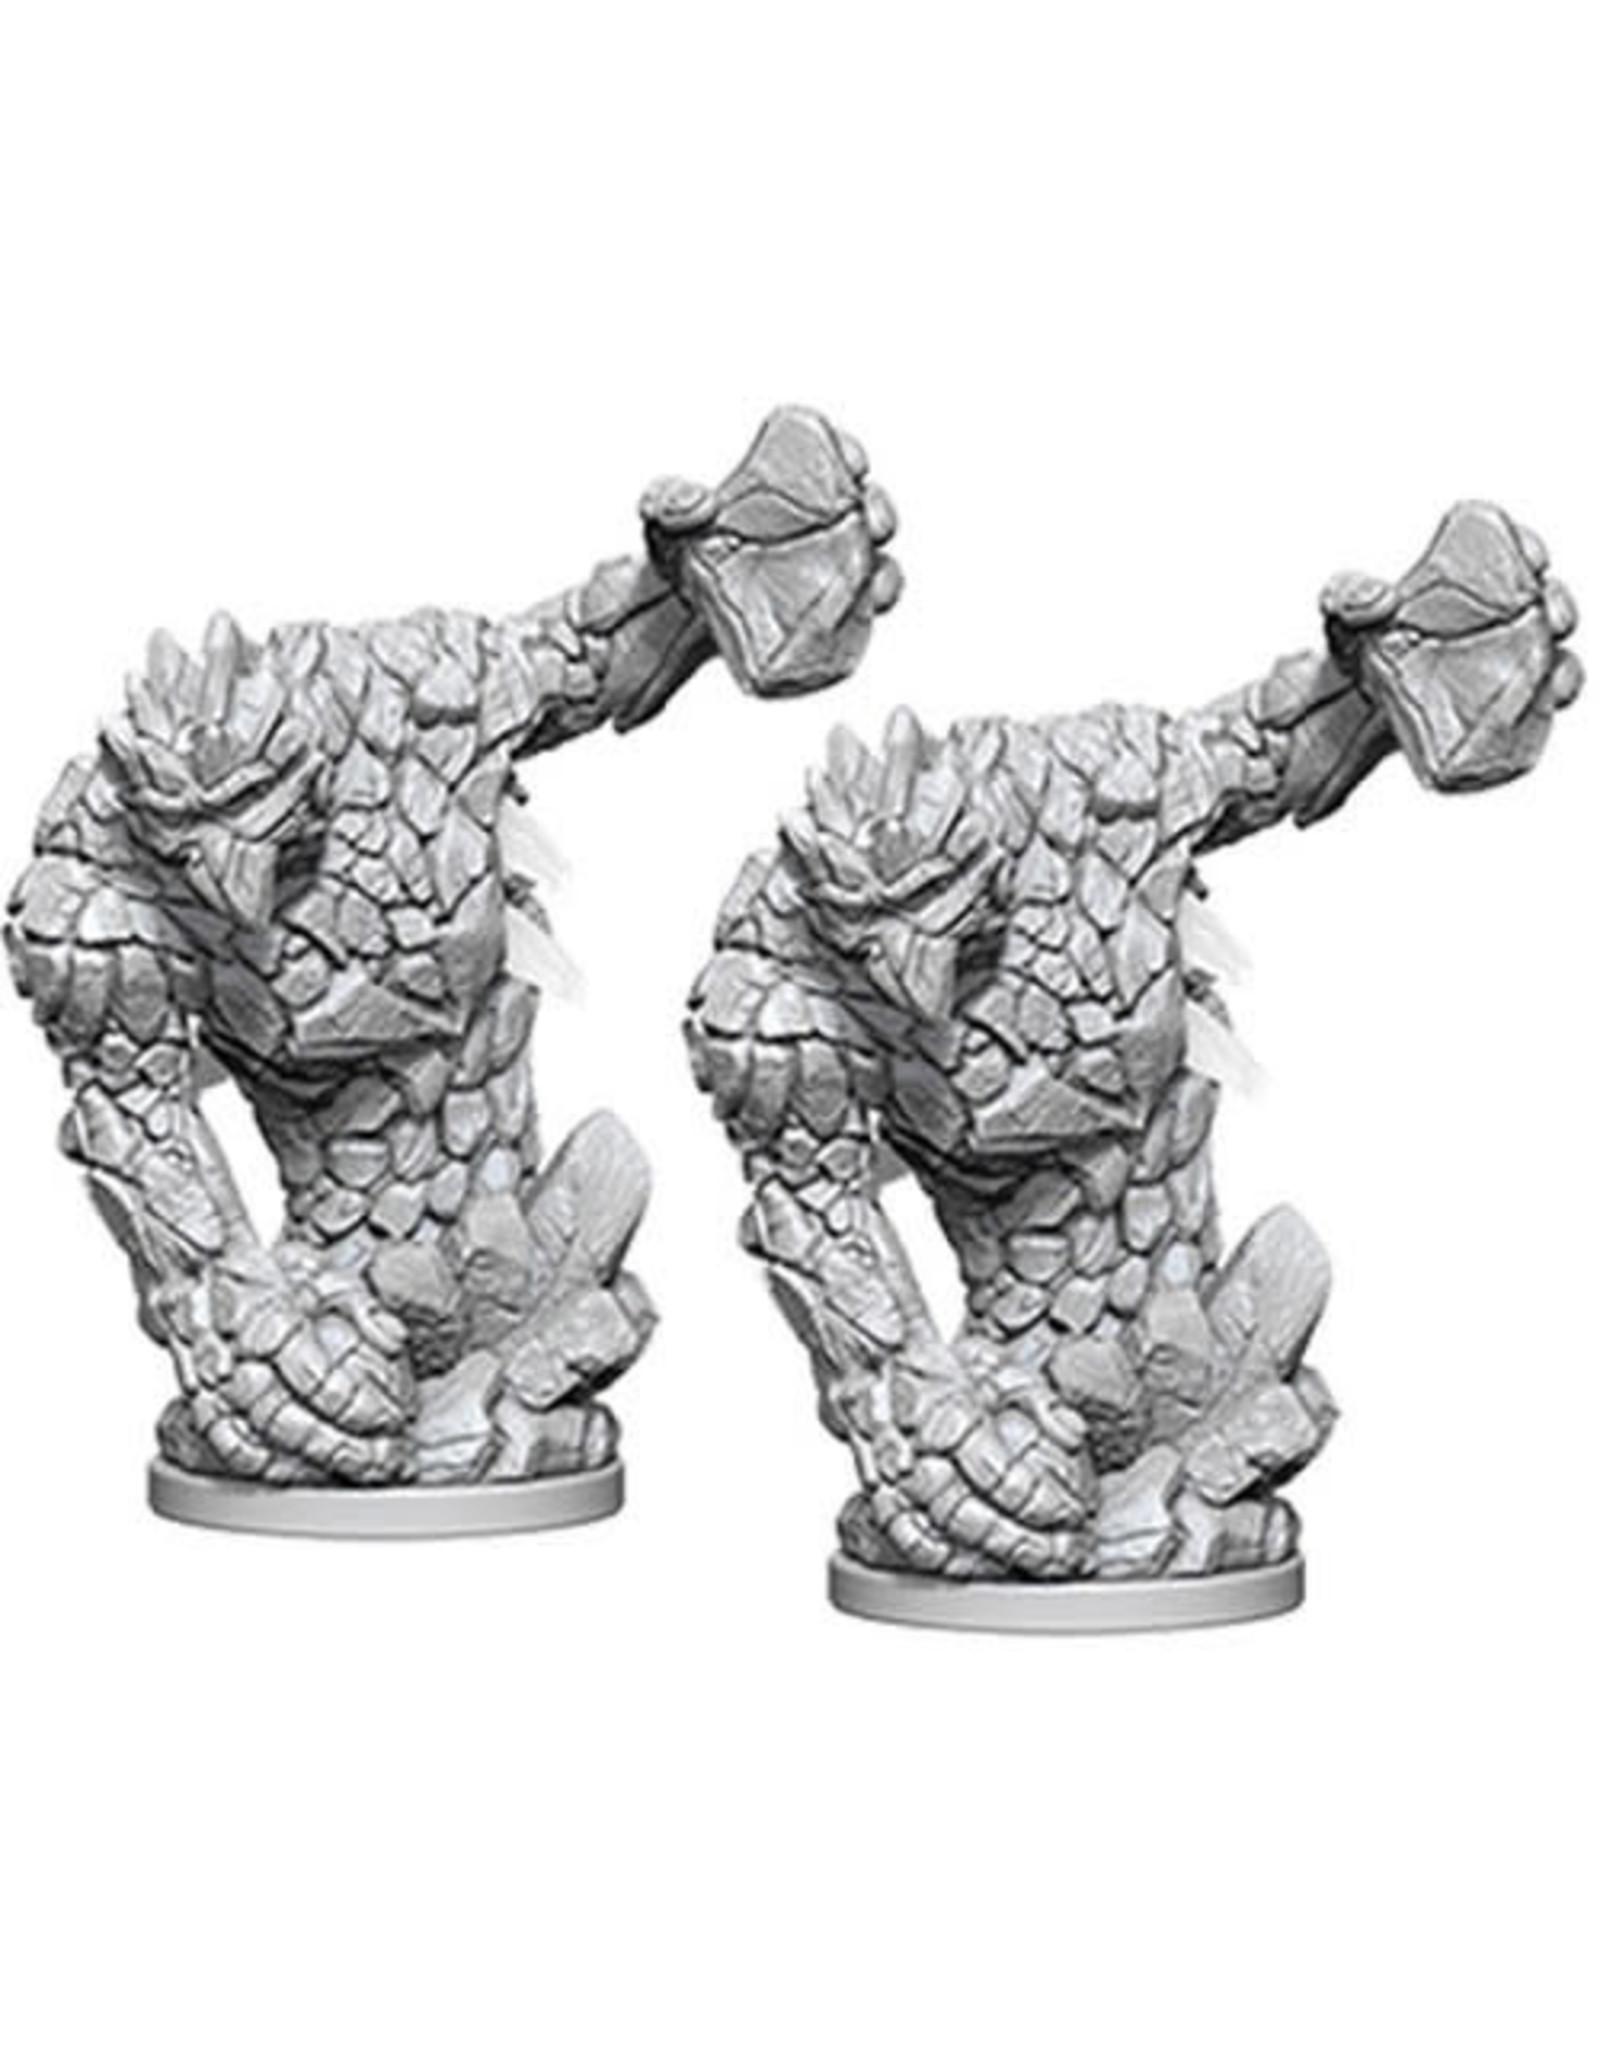 WizKids Pathfinder Deep Cuts Unpainted Miniatures: W5 Medium Earth Elemental